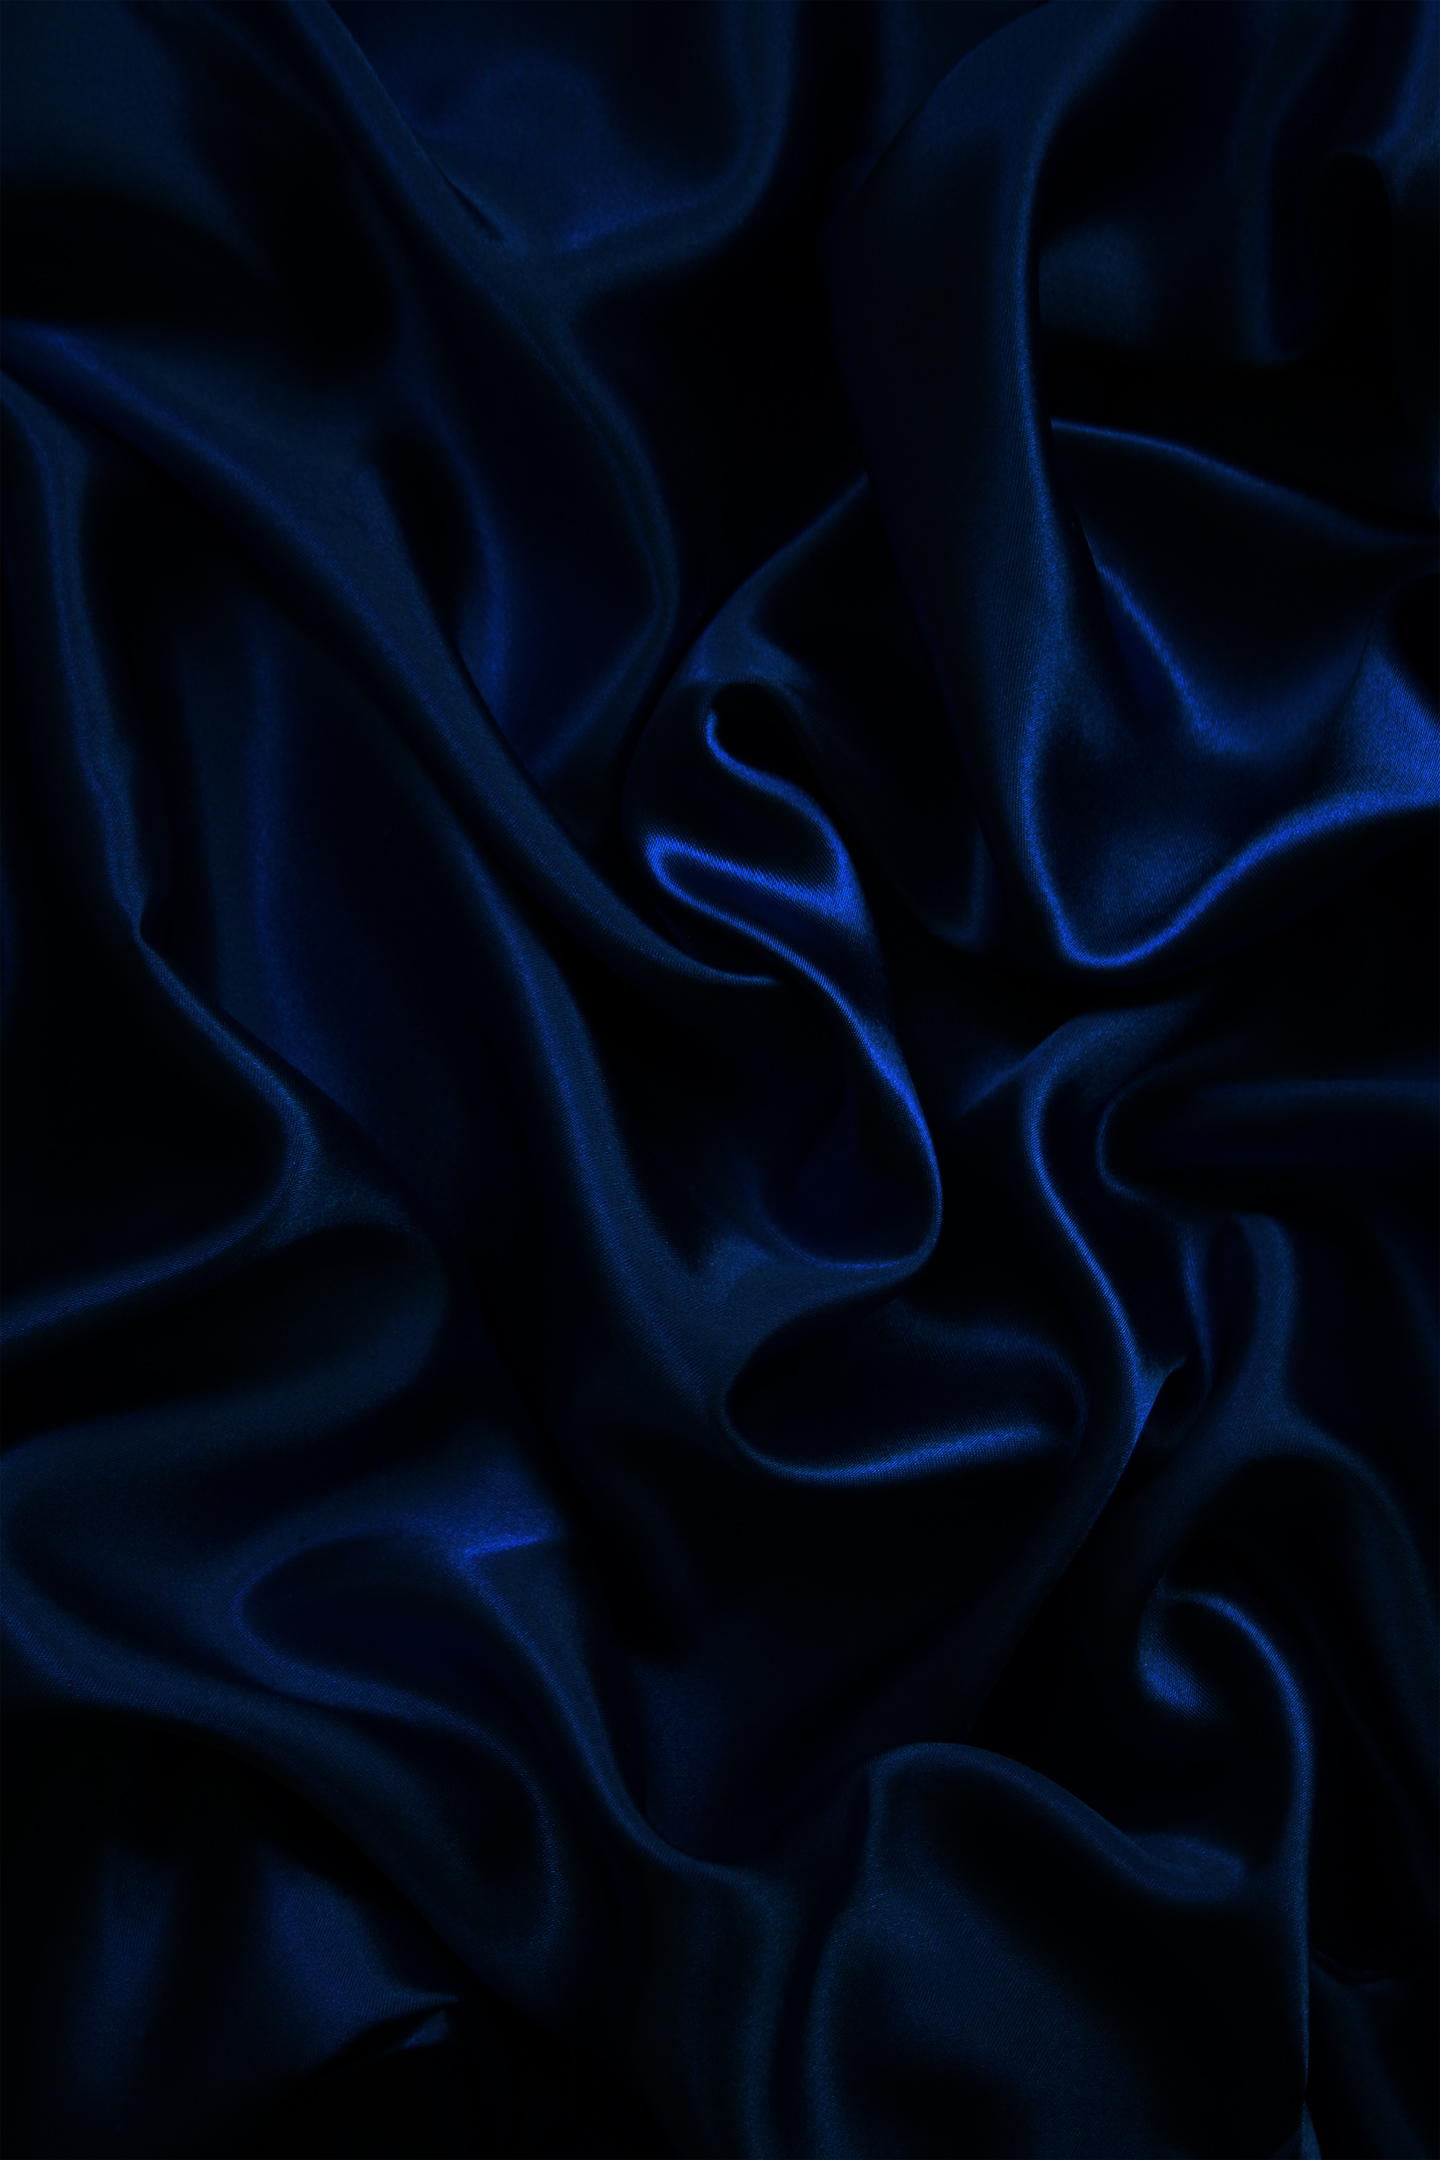 blue satin wallpaper